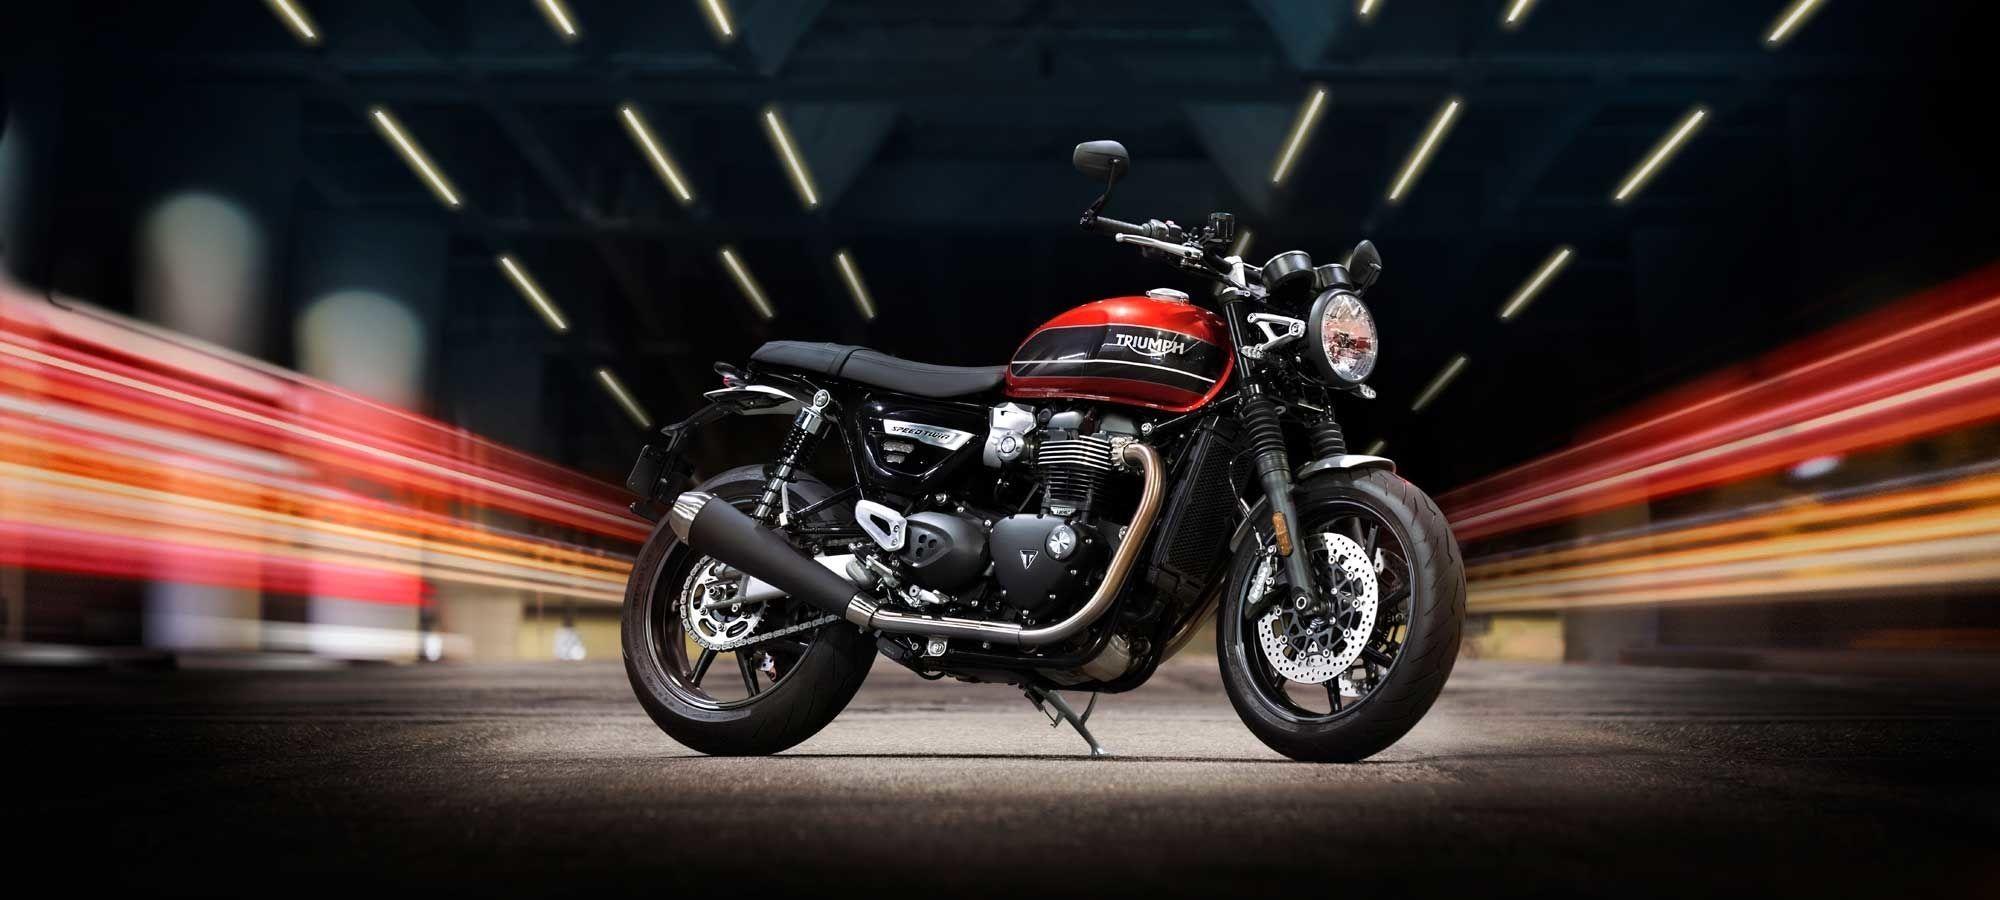 2019 Triumph Speed Twin First Look Motorcyclist Motos